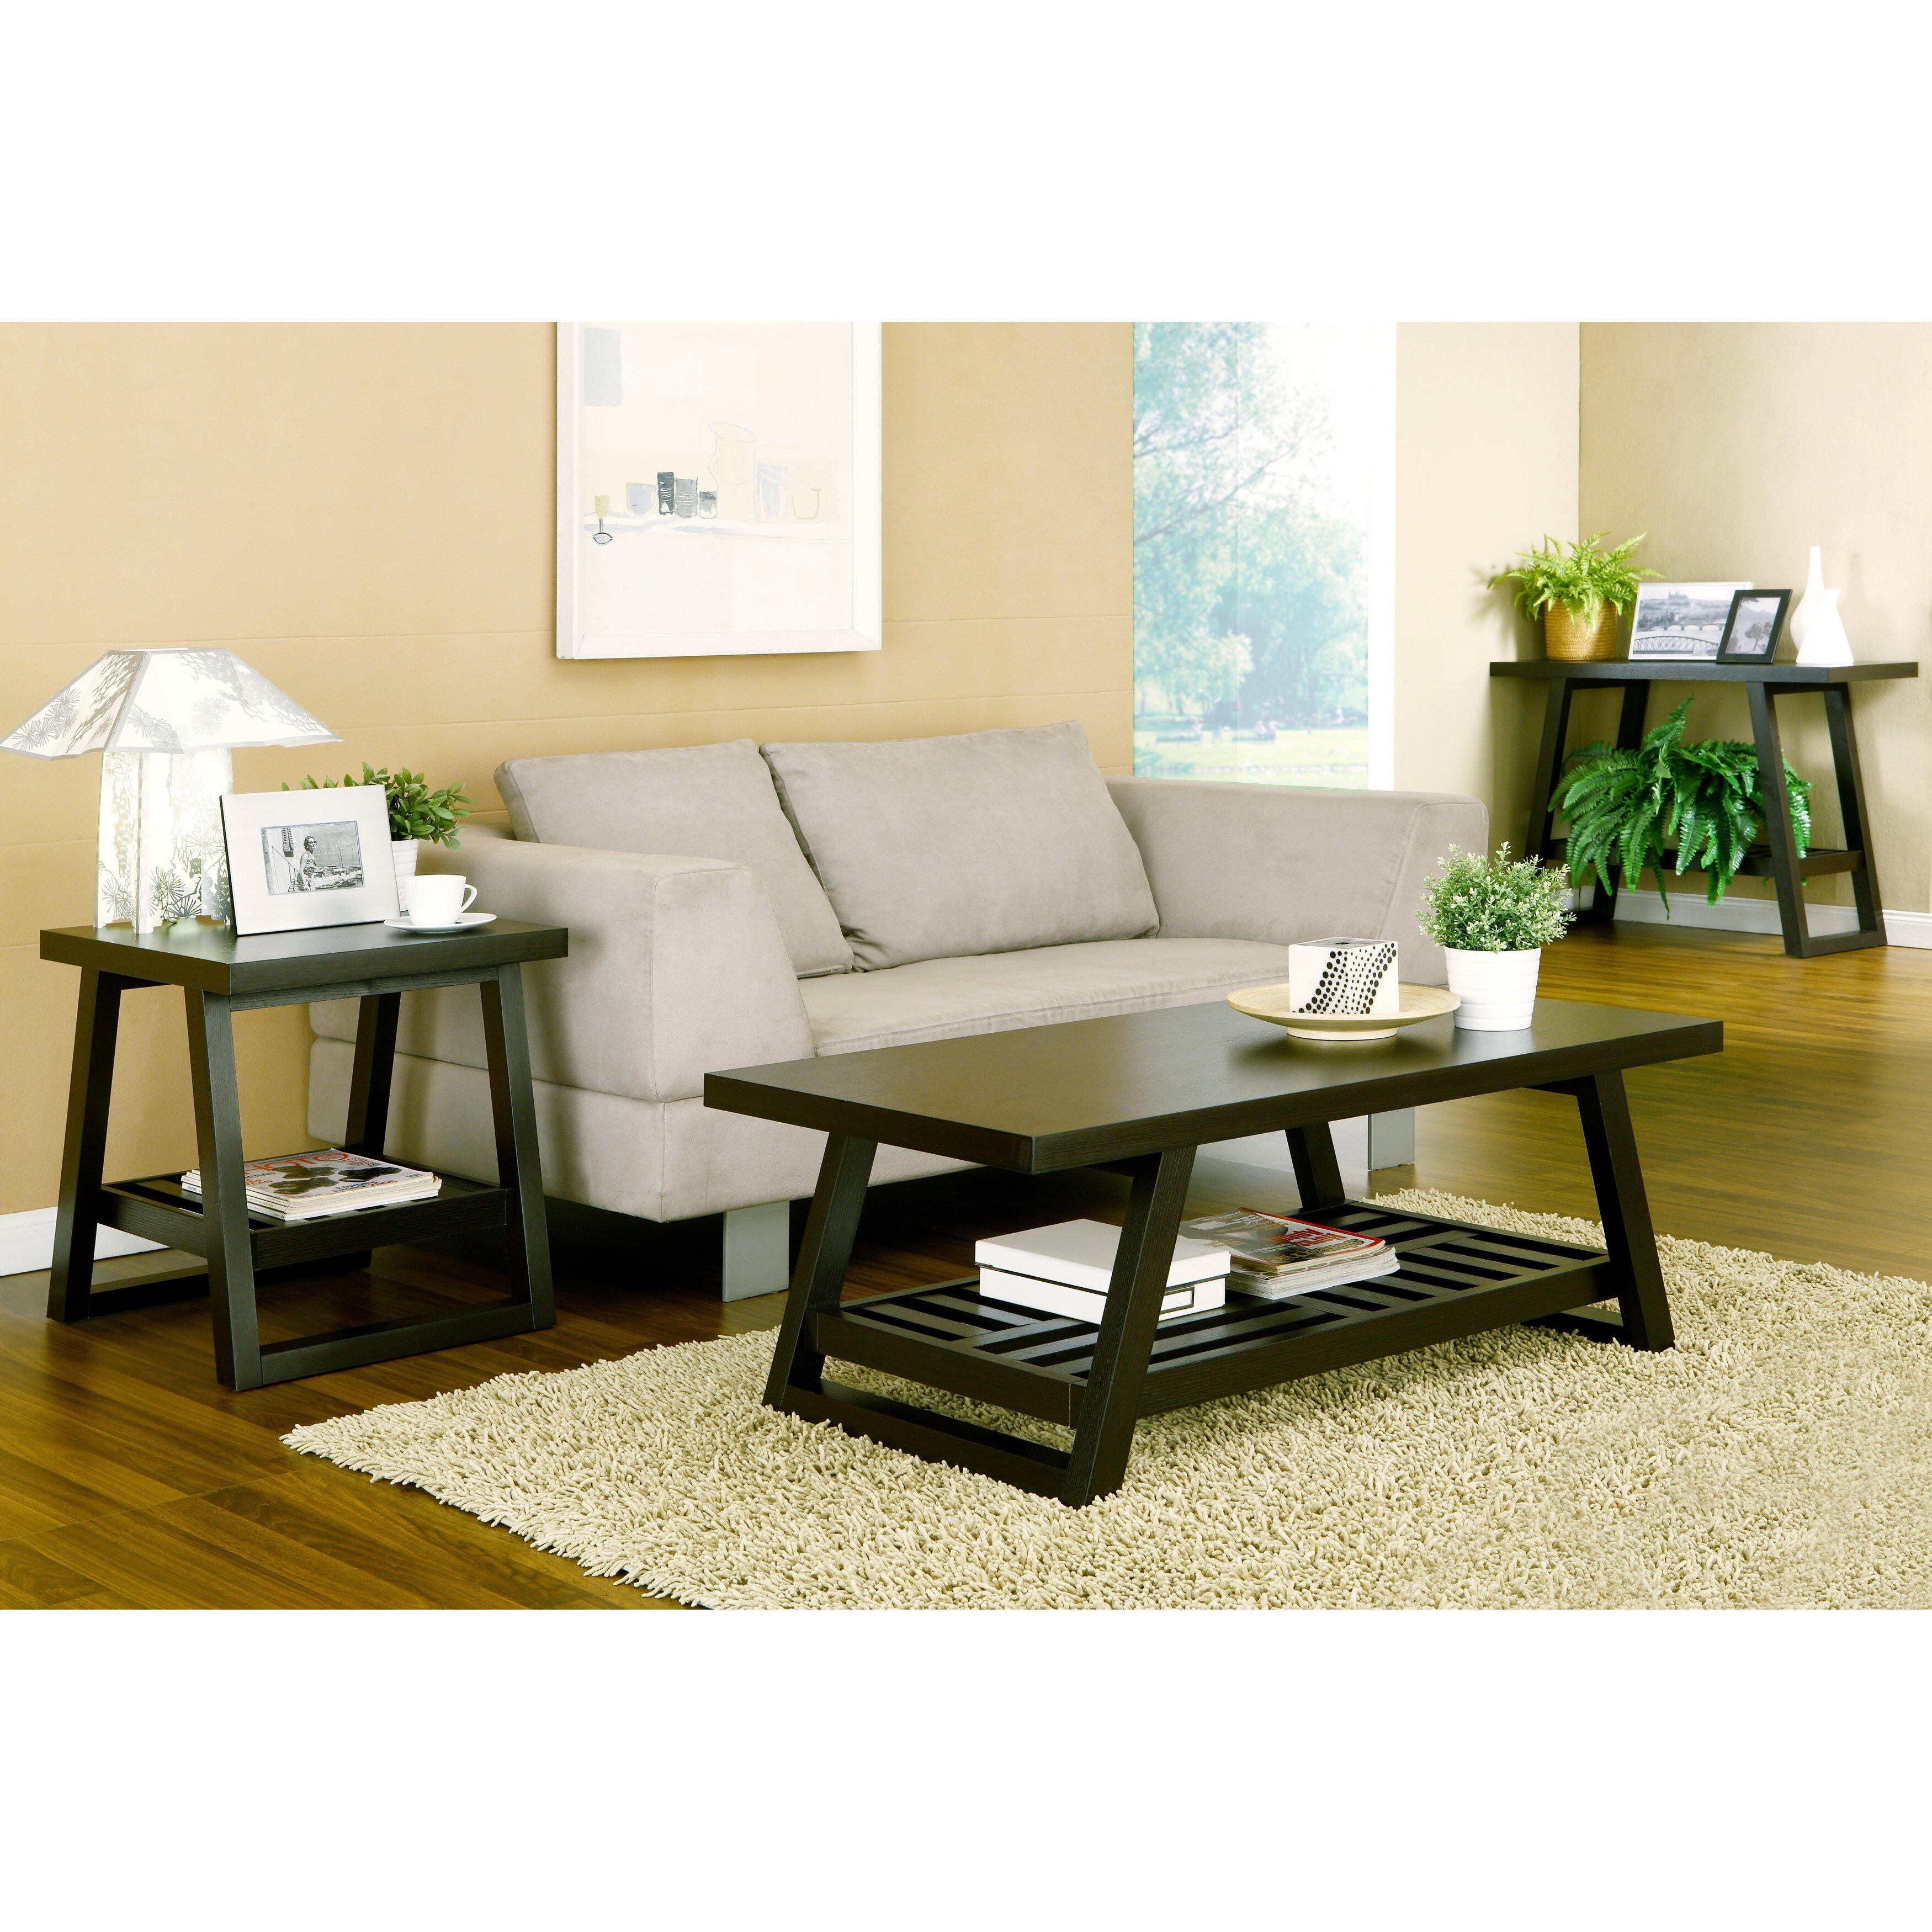 hokku designs parker 2 piece coffee table set reviews wayfair. Black Bedroom Furniture Sets. Home Design Ideas